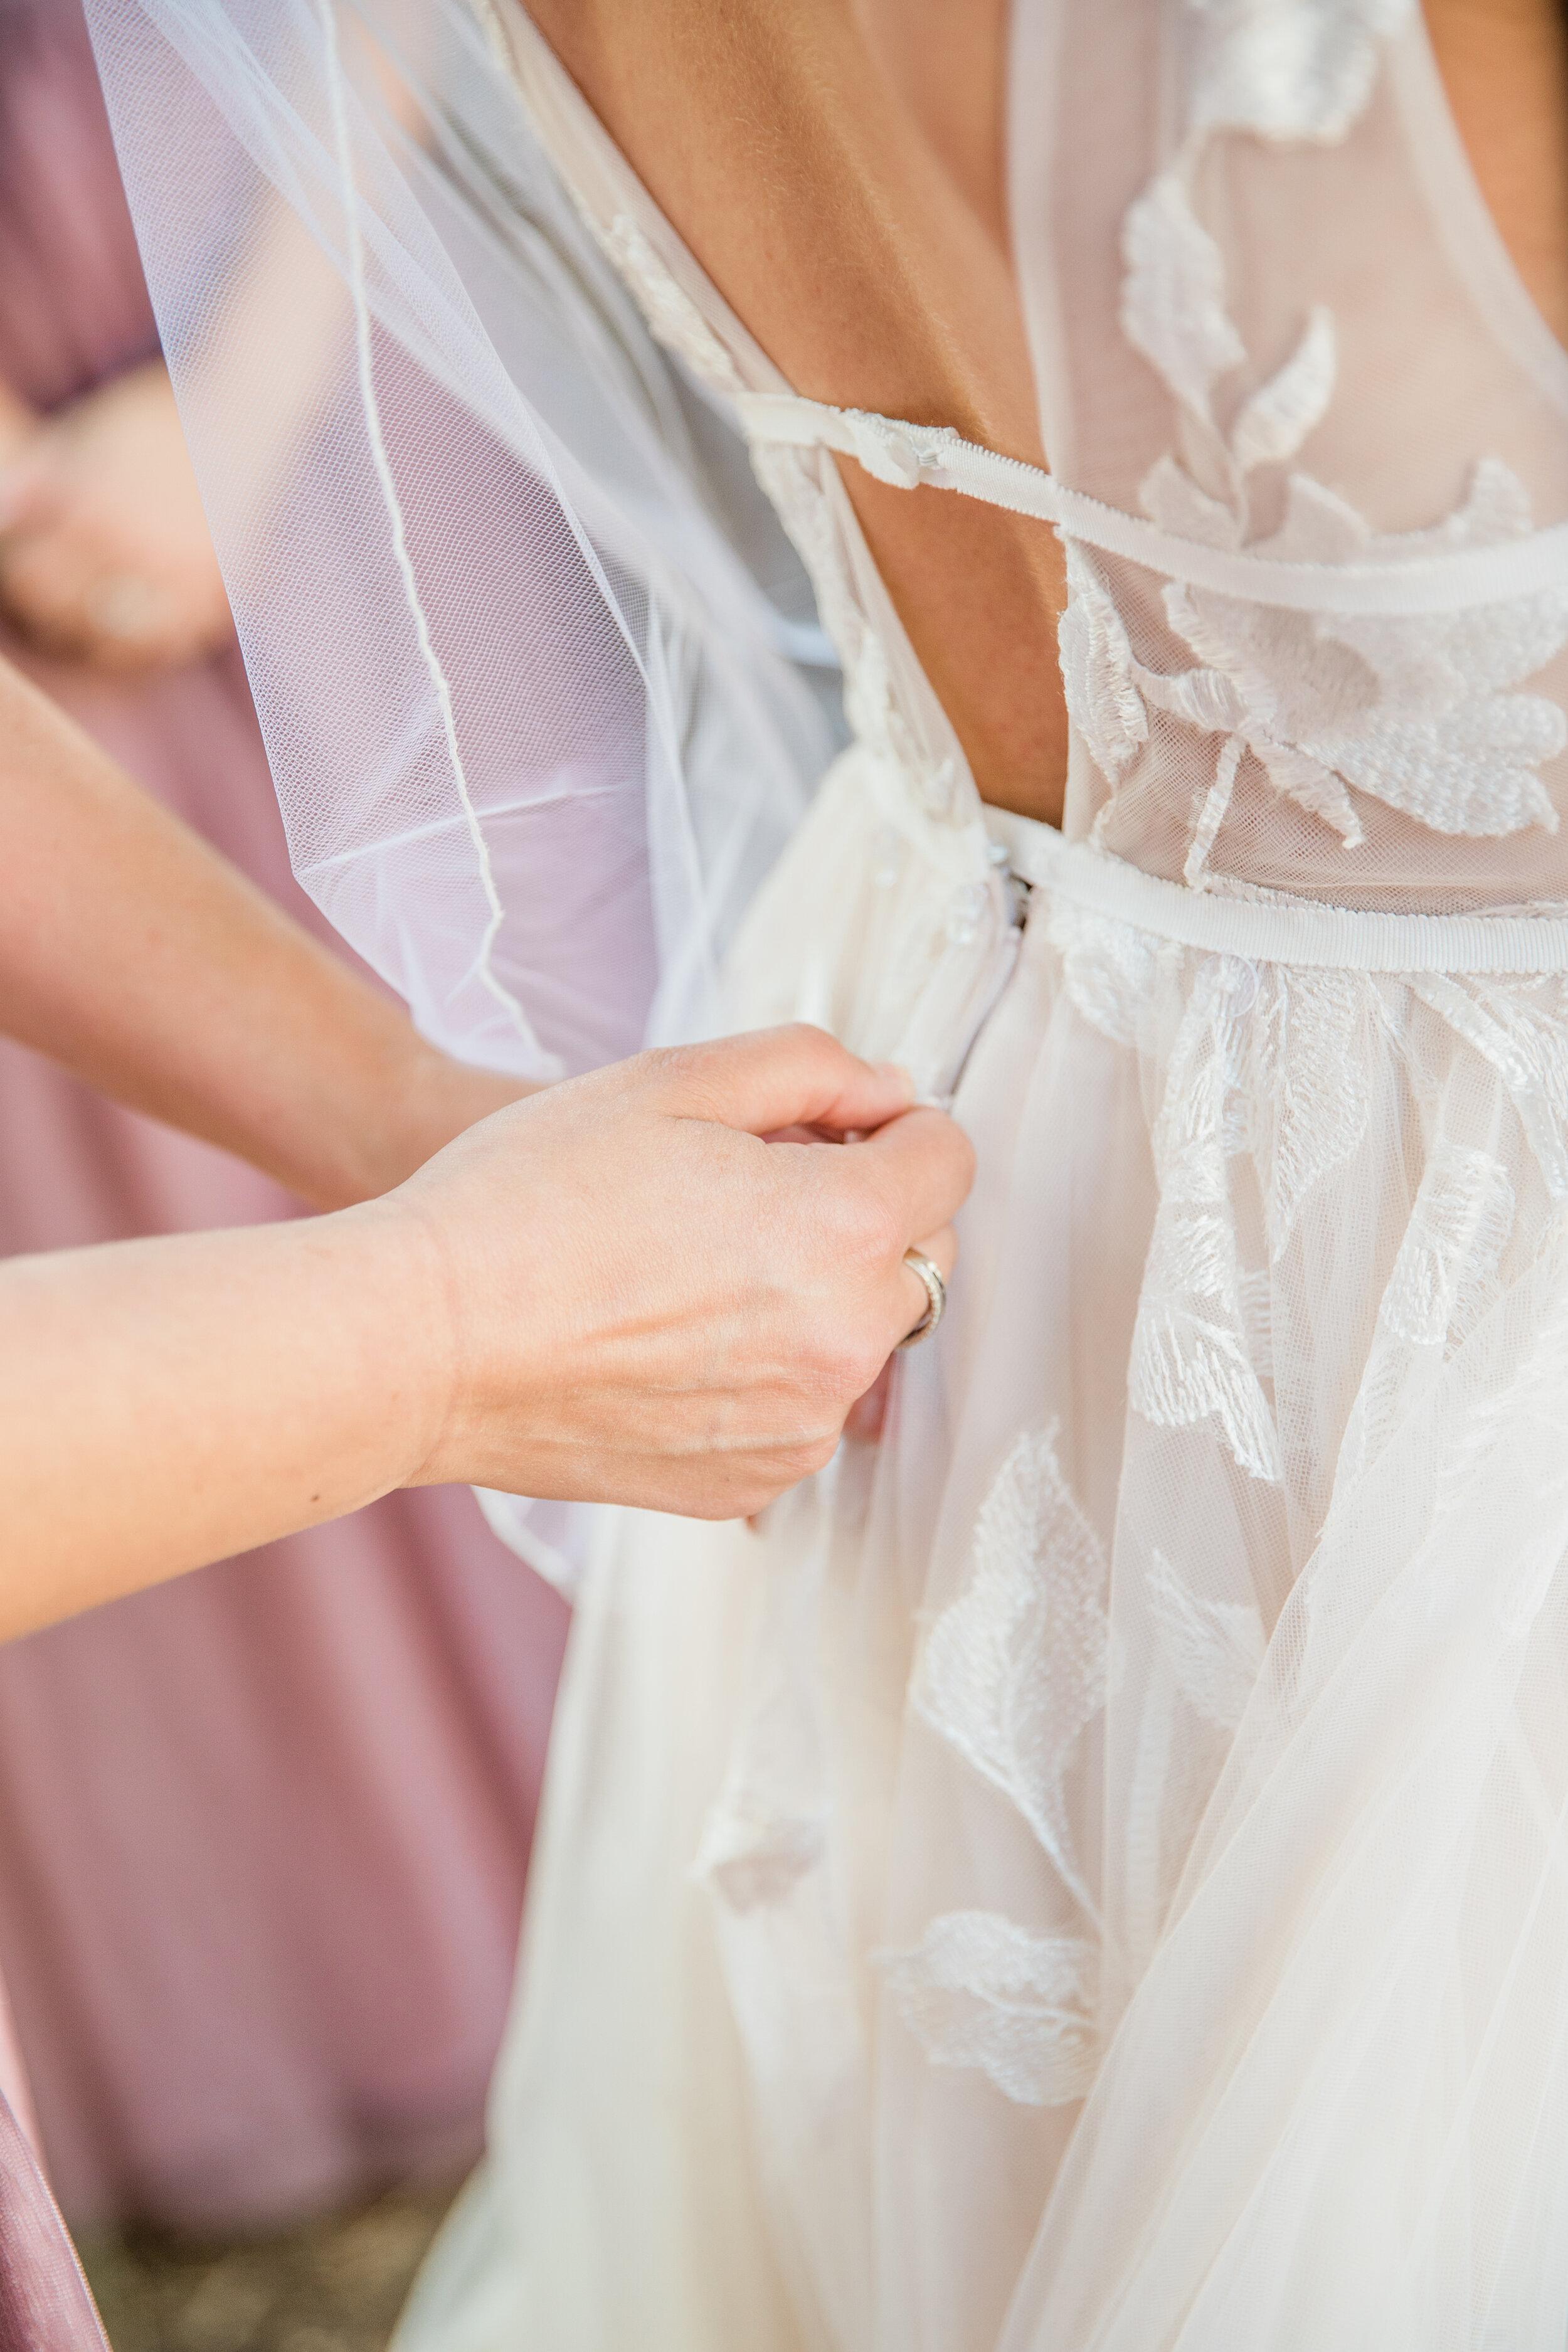 Leanne and Joe - Married - Sneak Peeks - Lauren Alisse Photography-10.jpg